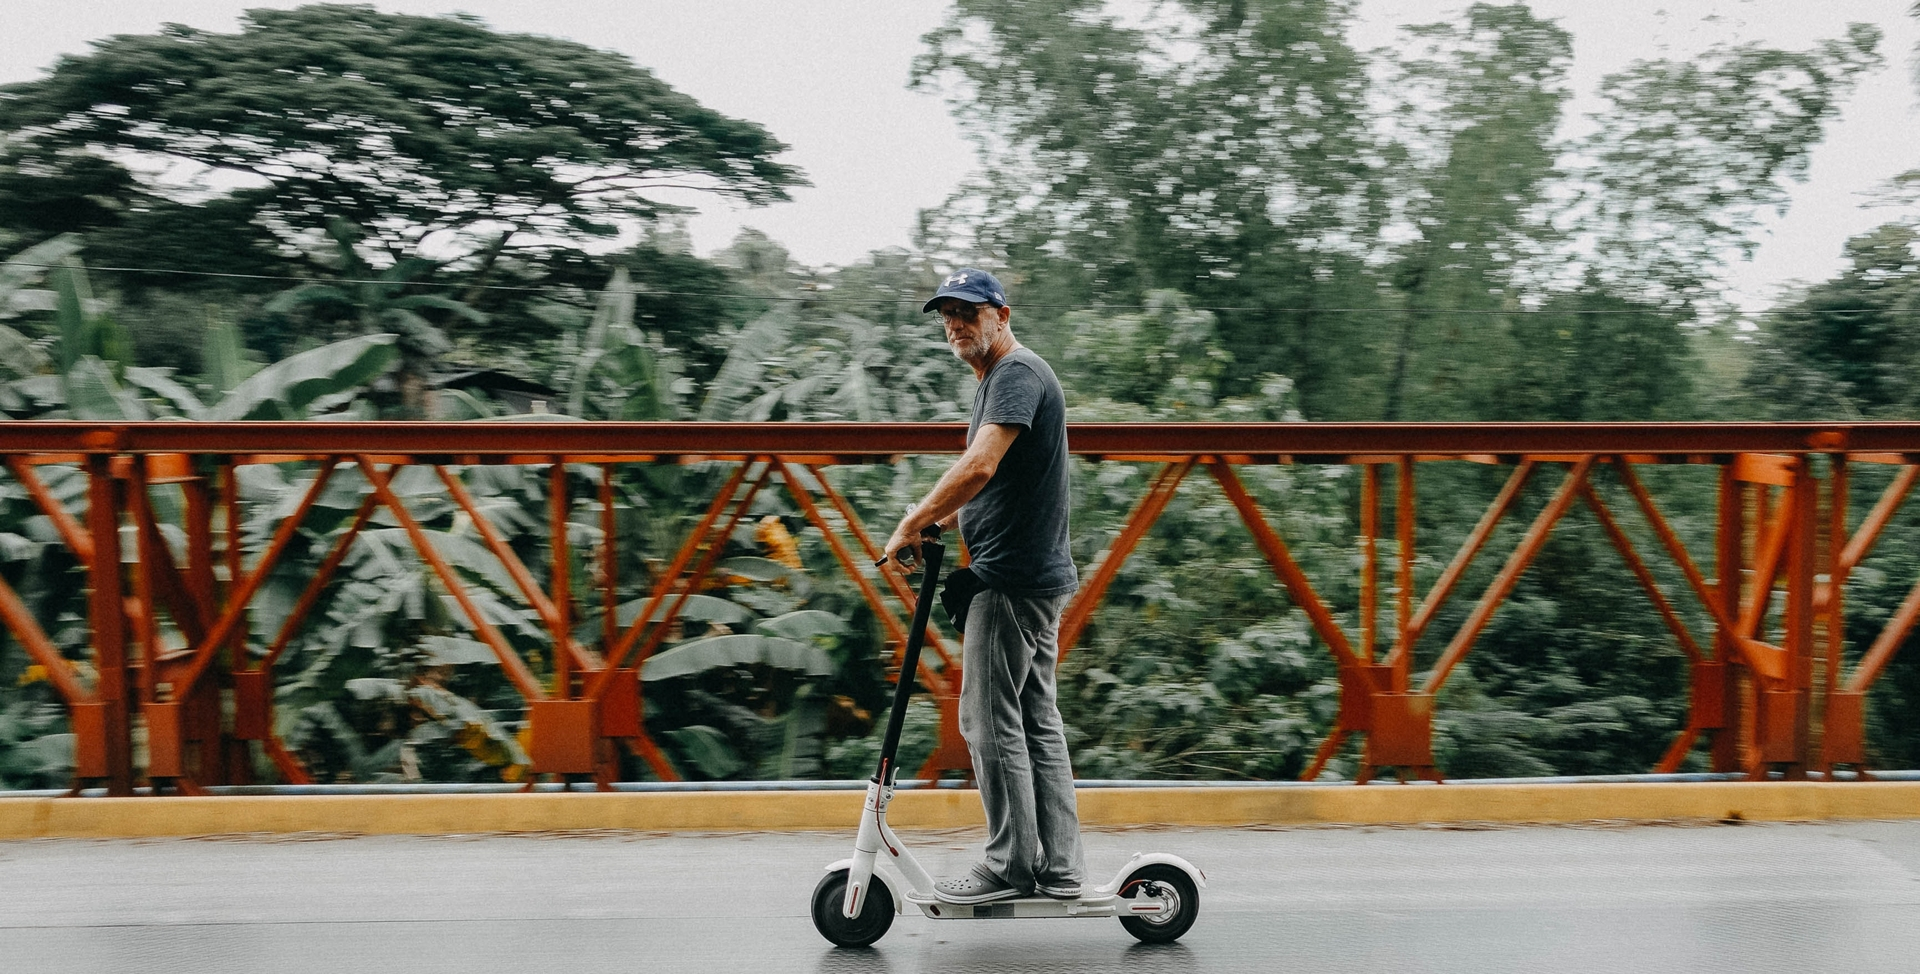 Immer mehr E-Scooter Fahrer landen im Krankenhaus